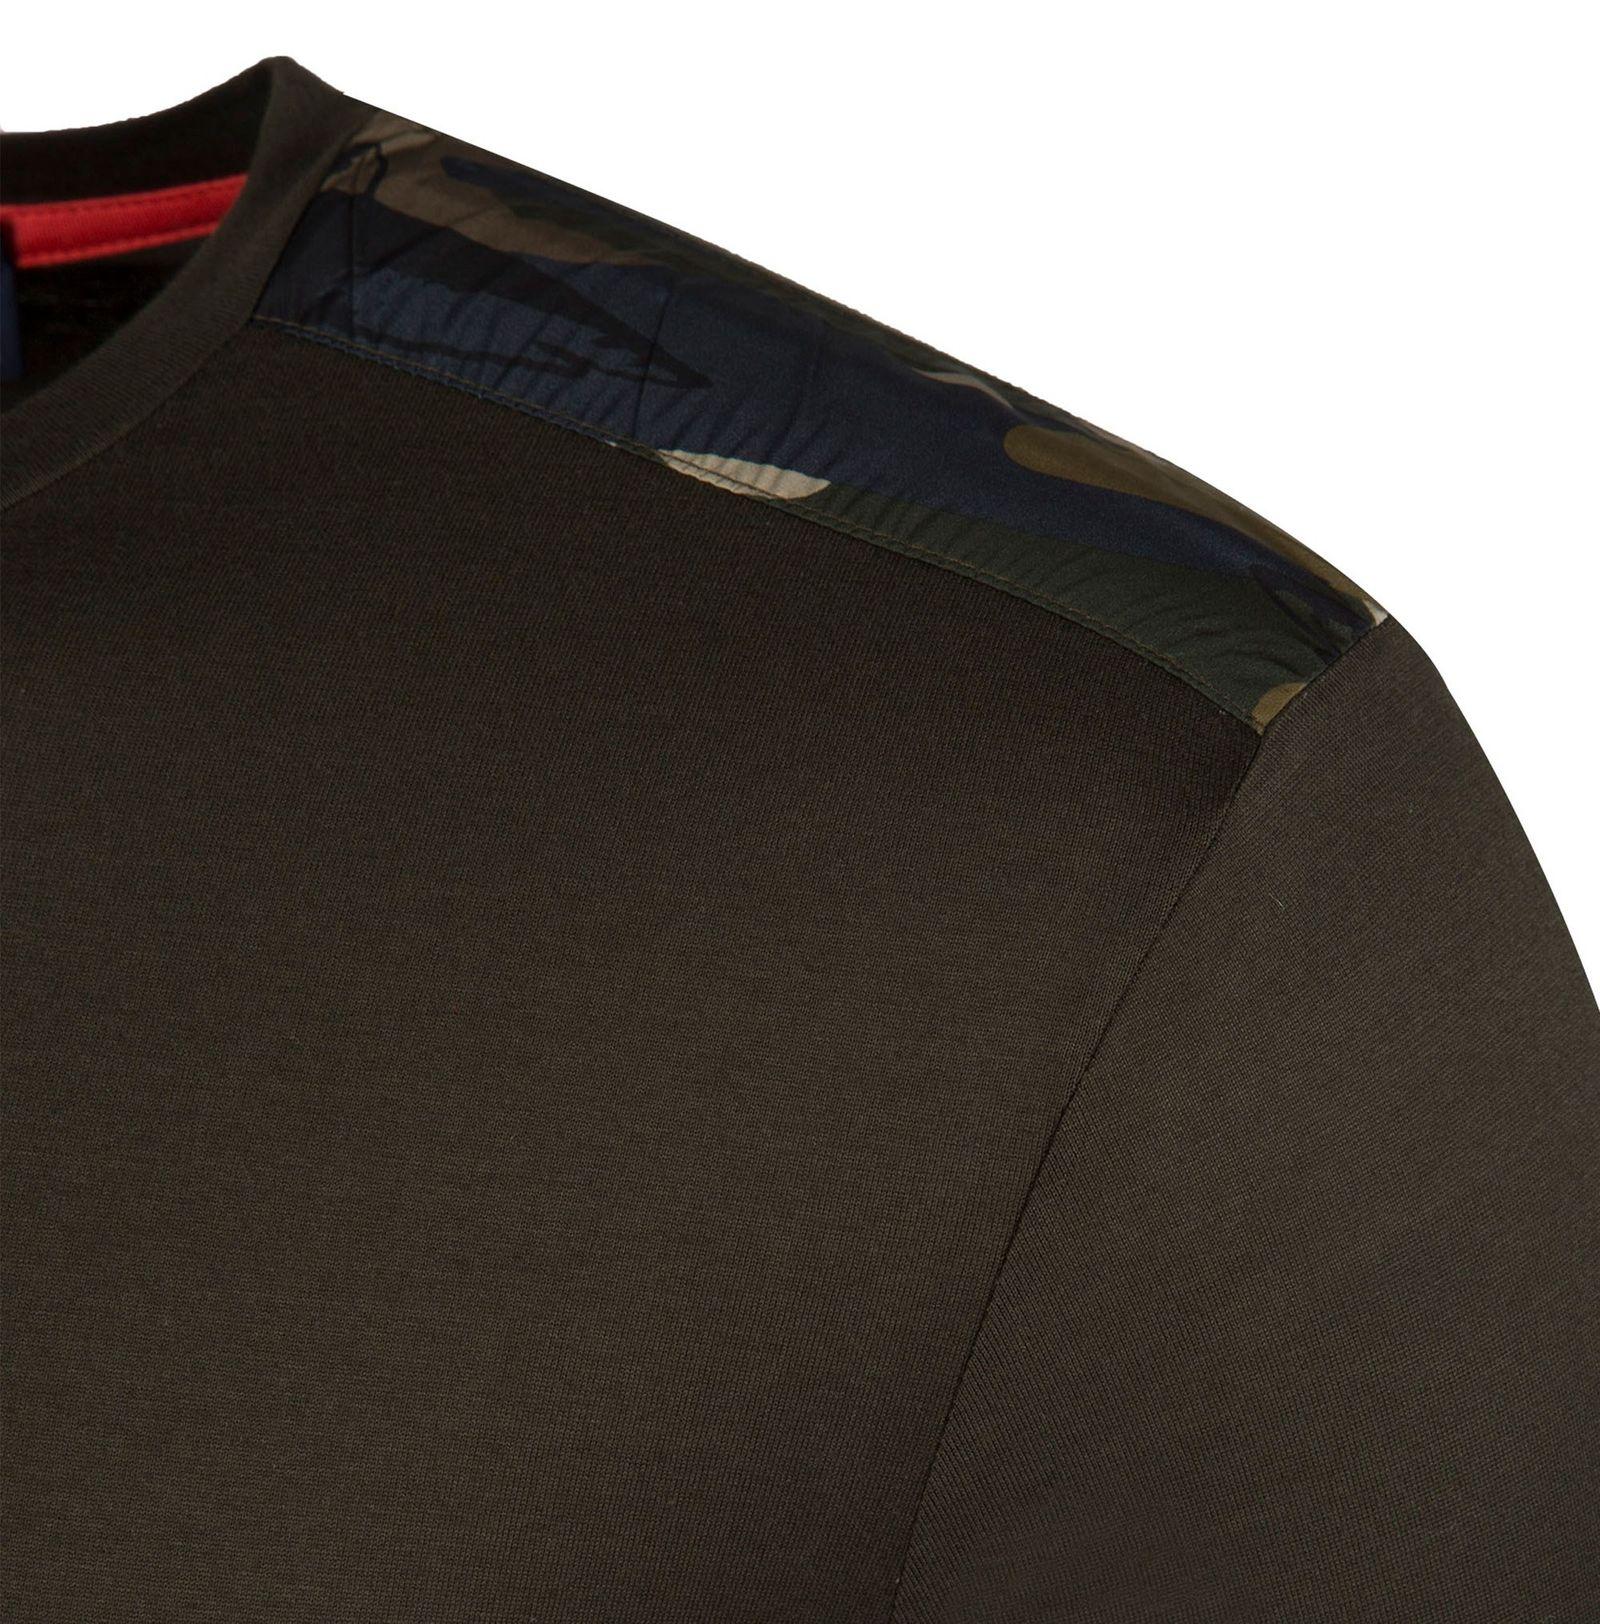 تی شرت نخی یقه گرد مردانه - پاول اند شارک - زيتوني تيره - 4